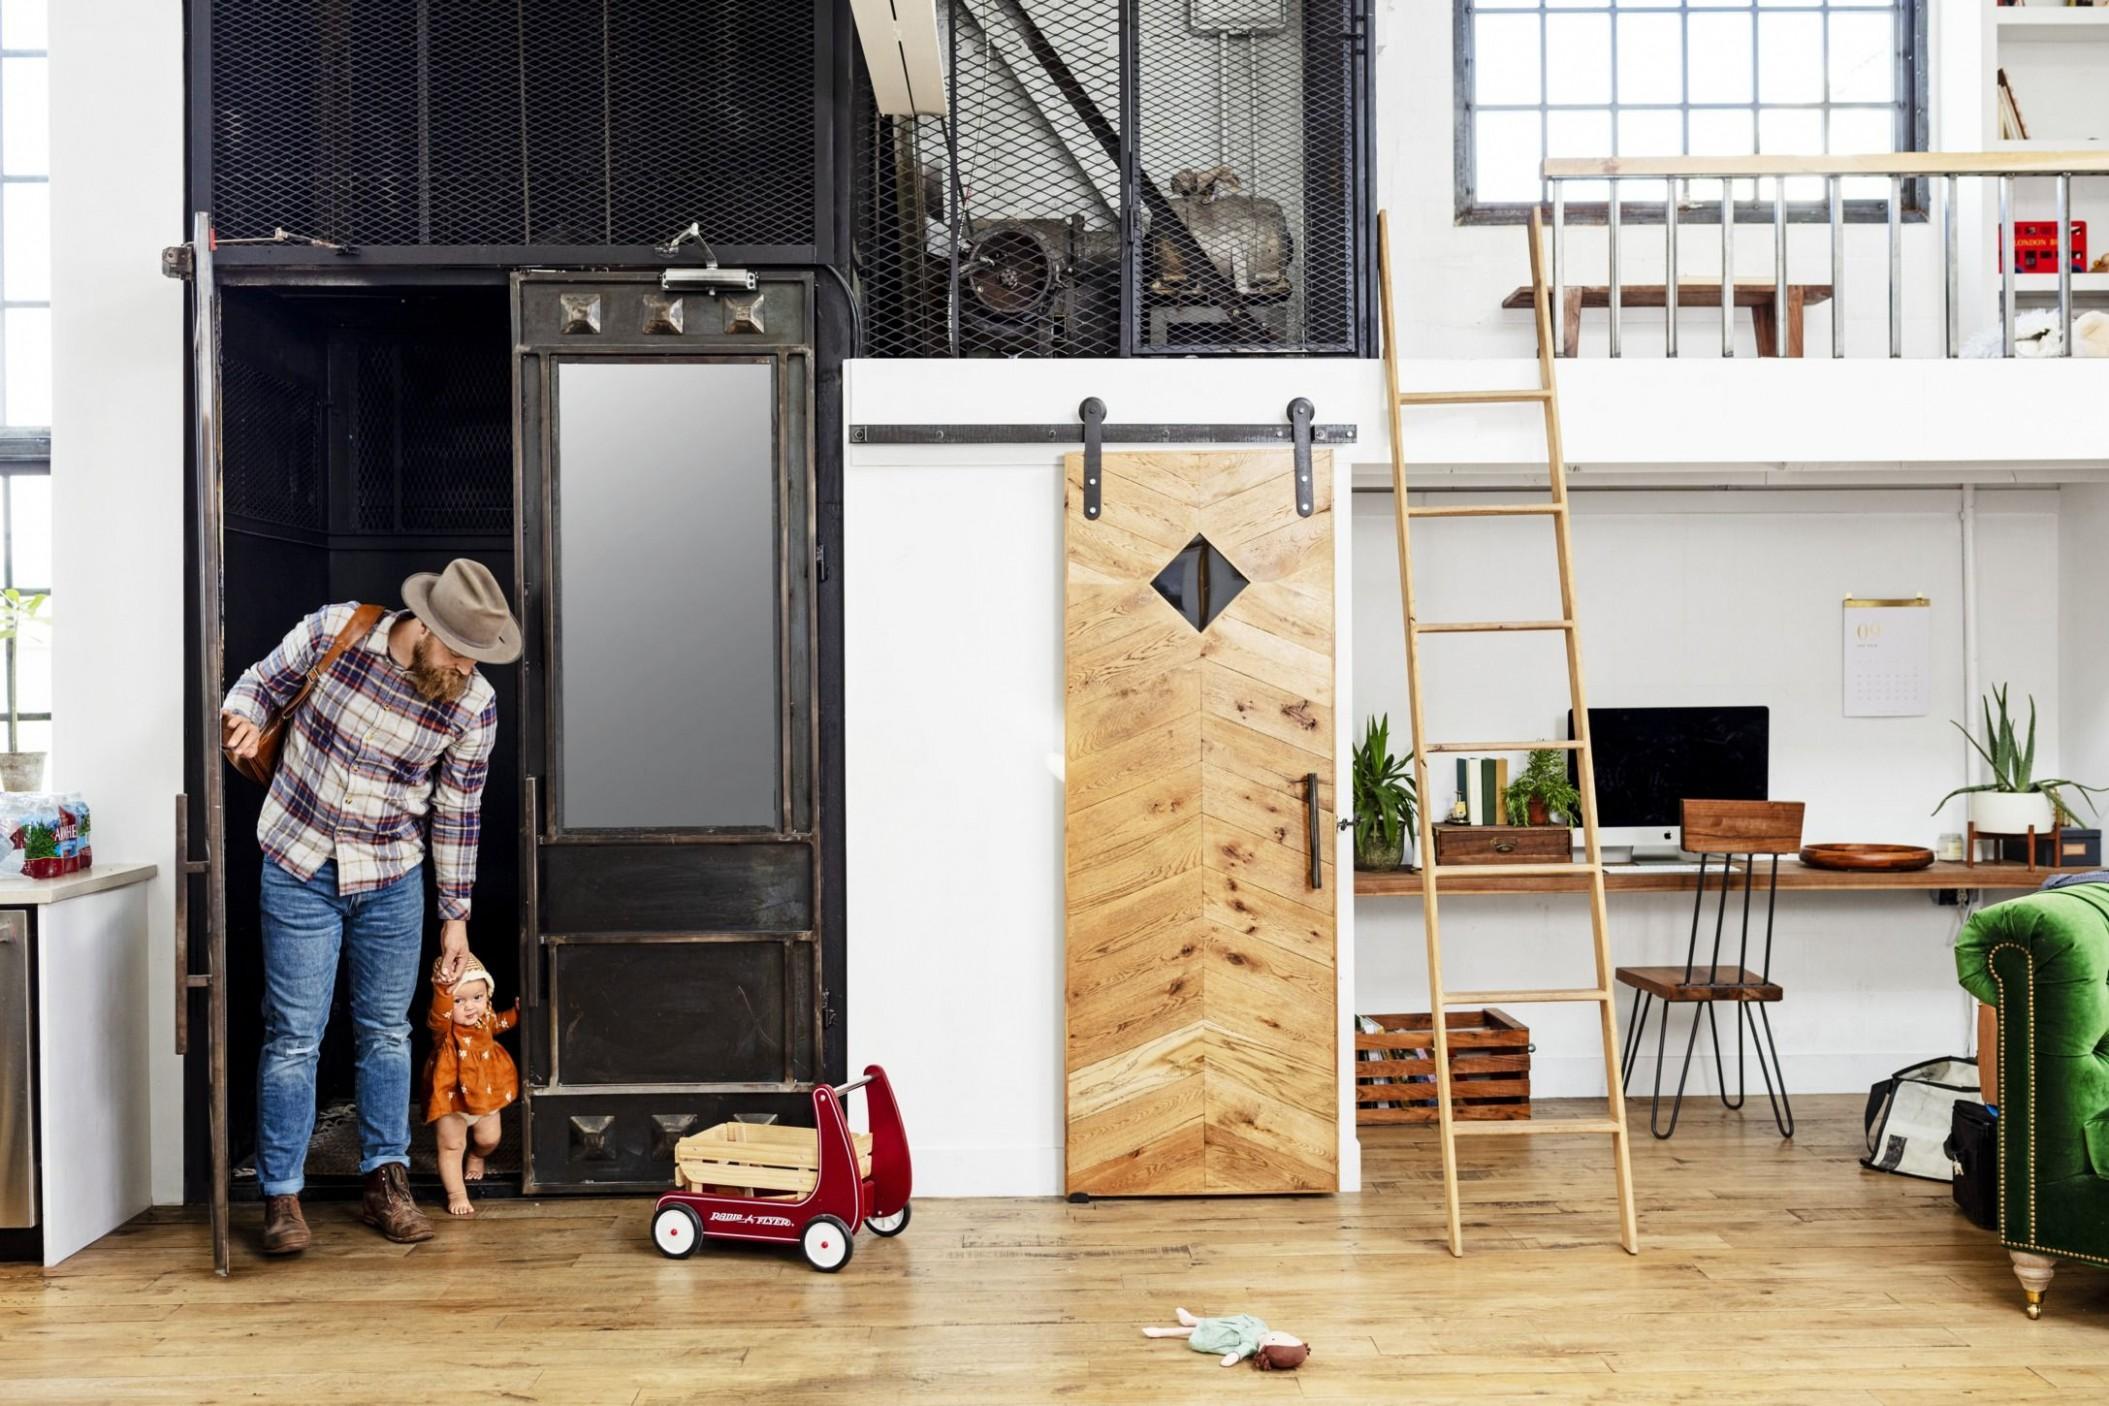 12 Best Home Office Ideas - Home Office Decor Photos - Home Office Renovation Ideas